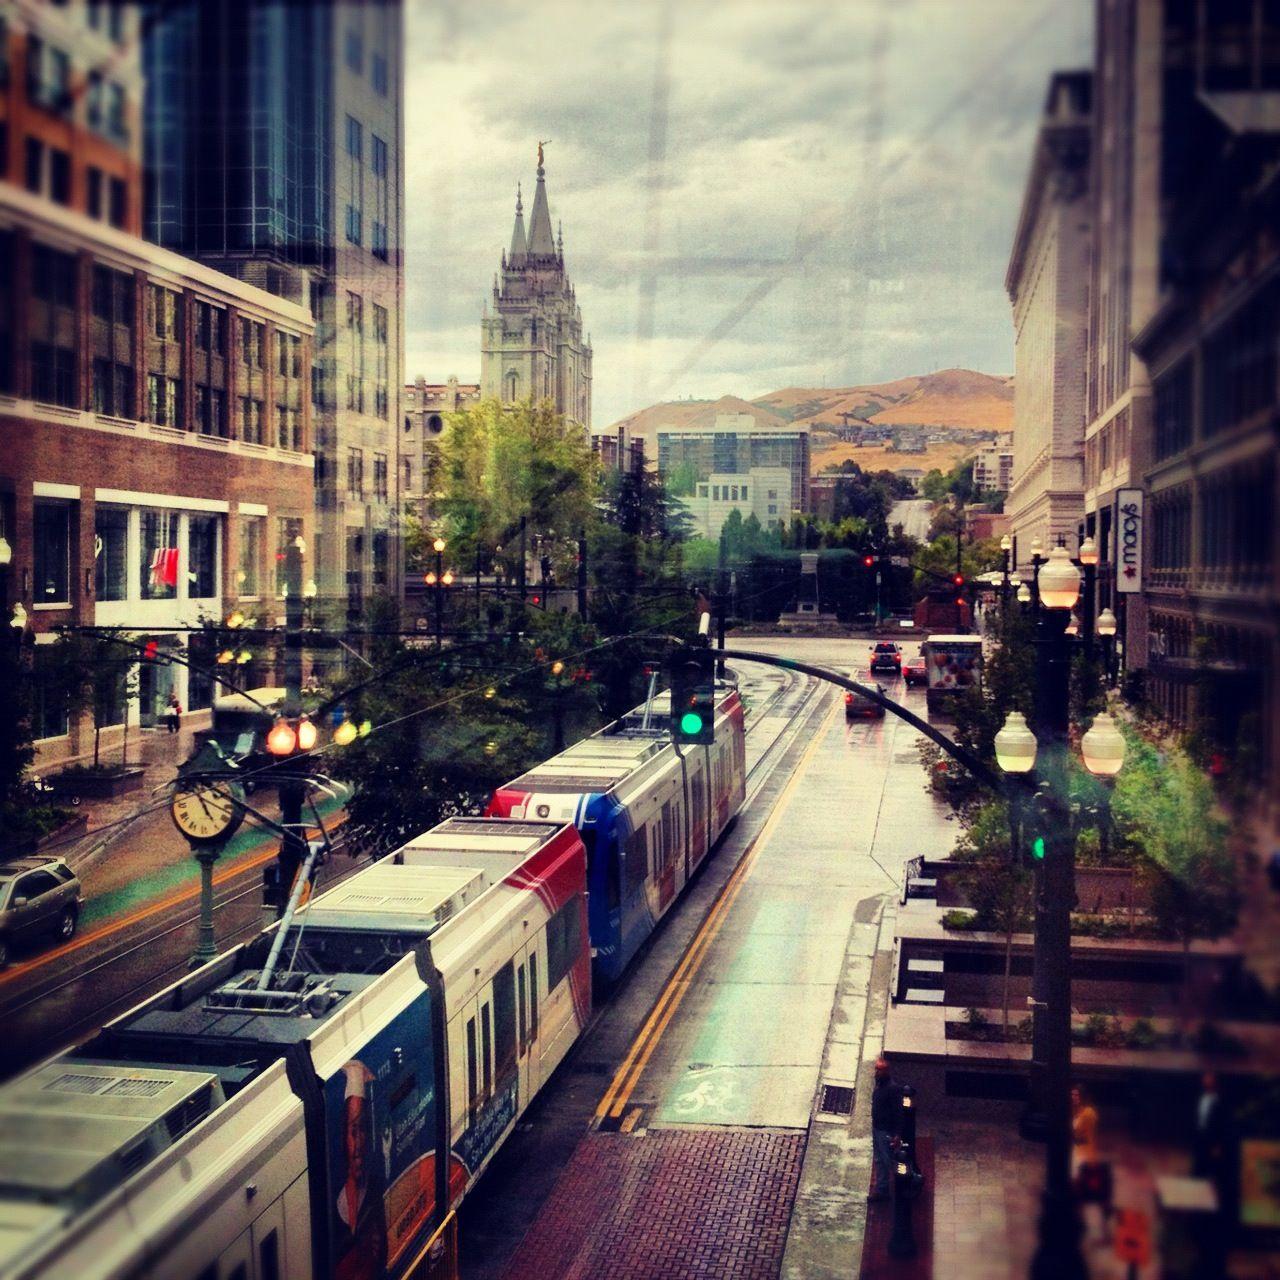 Downtown Salt Lake City Ut: Downtown Salt Lake City By Amanda Erbstoesser